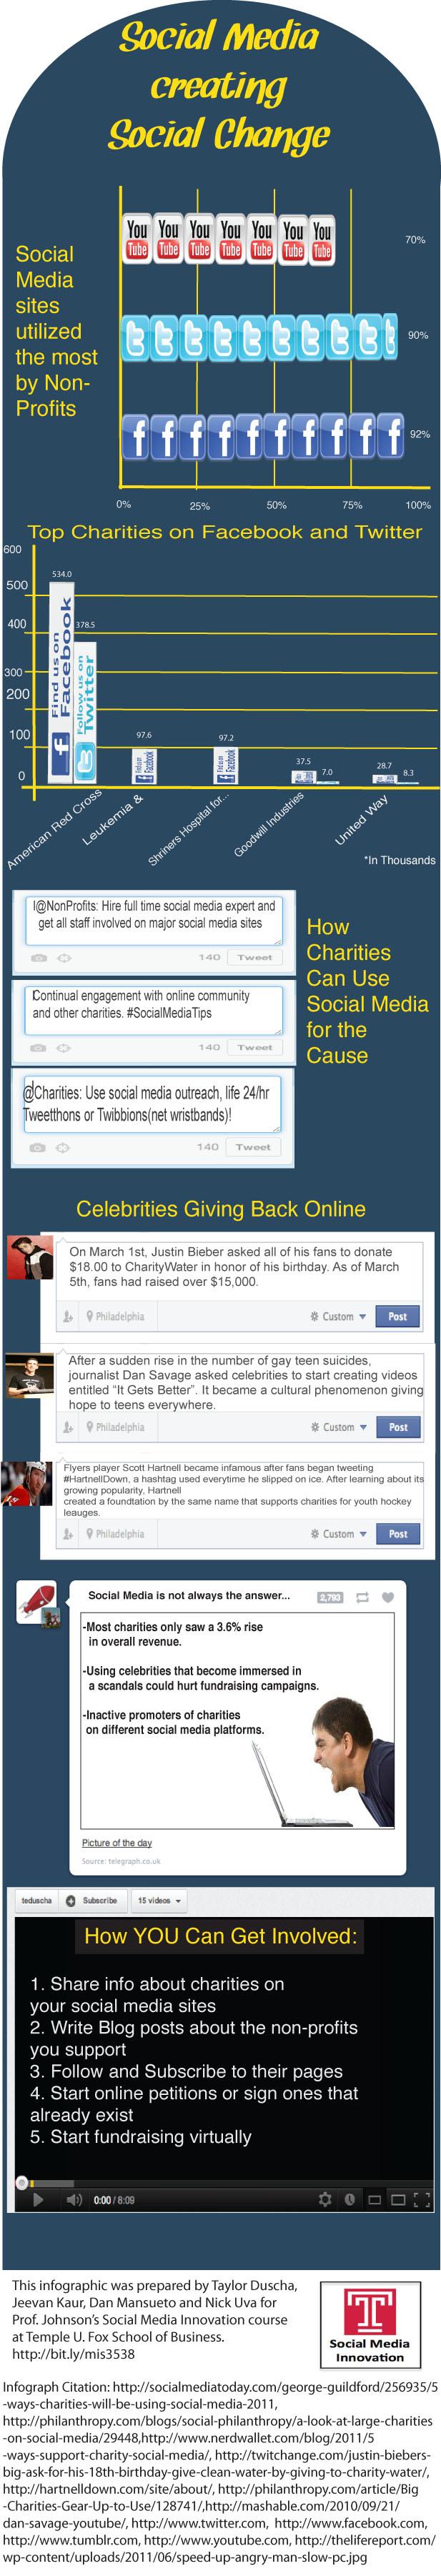 Social Media creating Social Change